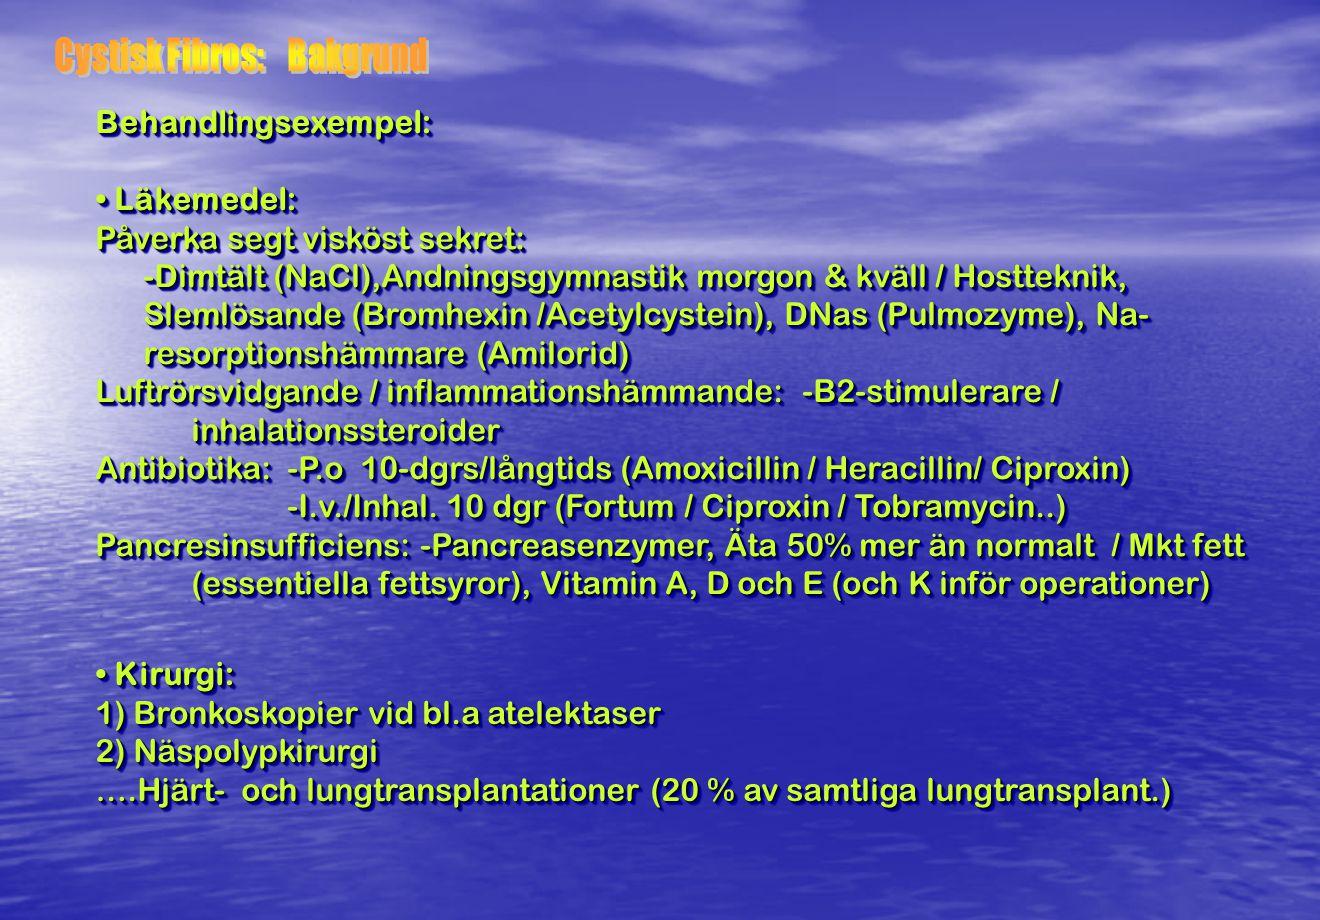 Cystisk Fibros: Bakgrund